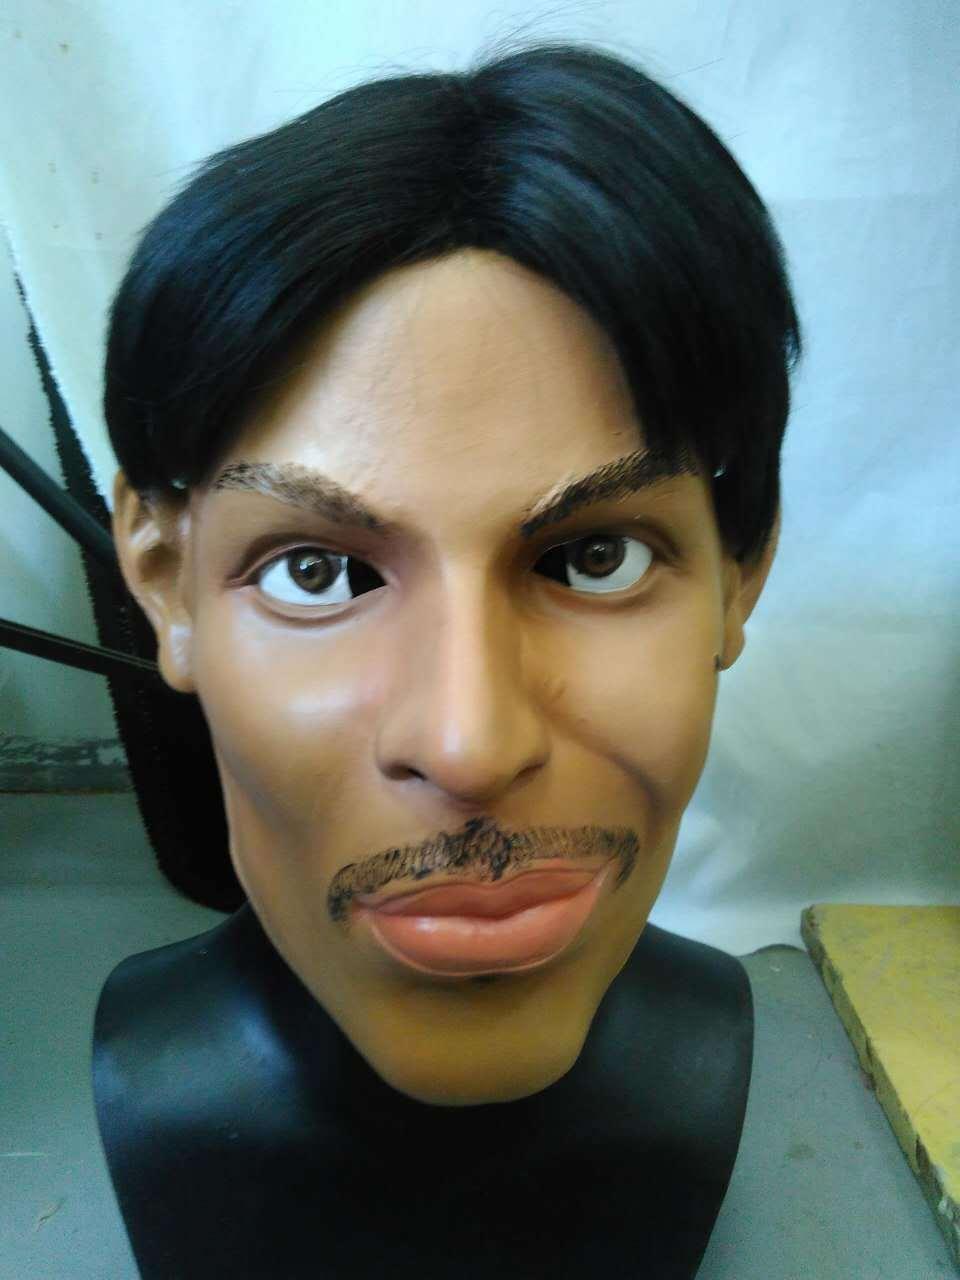 deluxe prince mask overhead latex fancy dress music artist celebrity